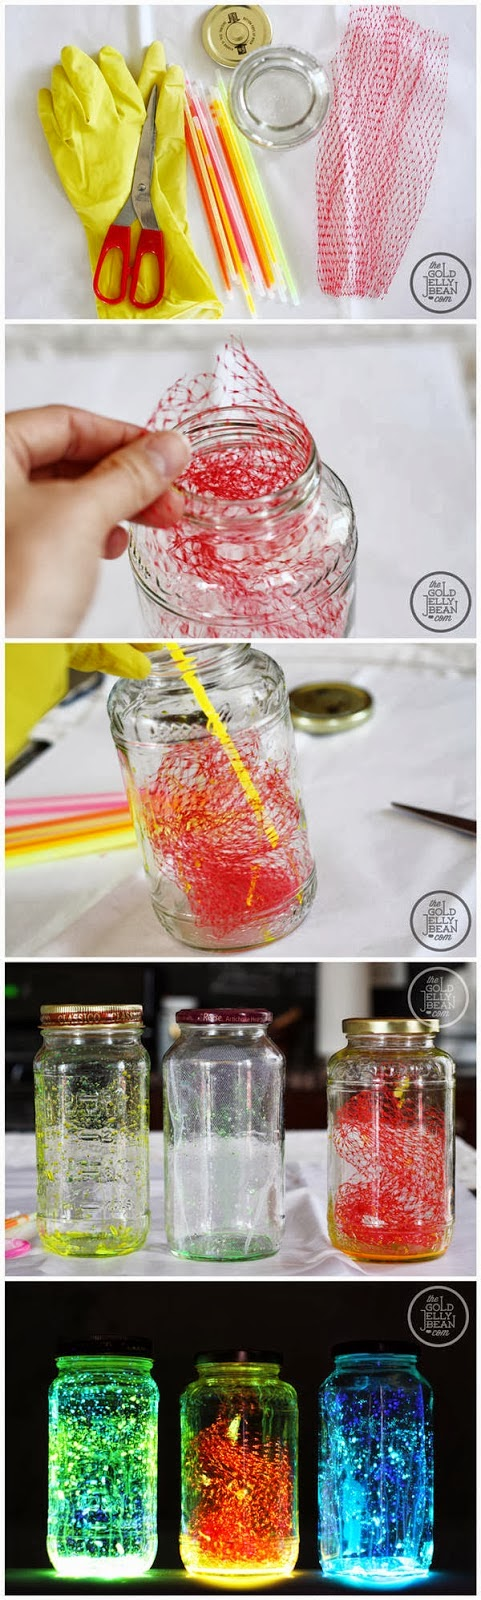 How To Make Glow Jars | DIY